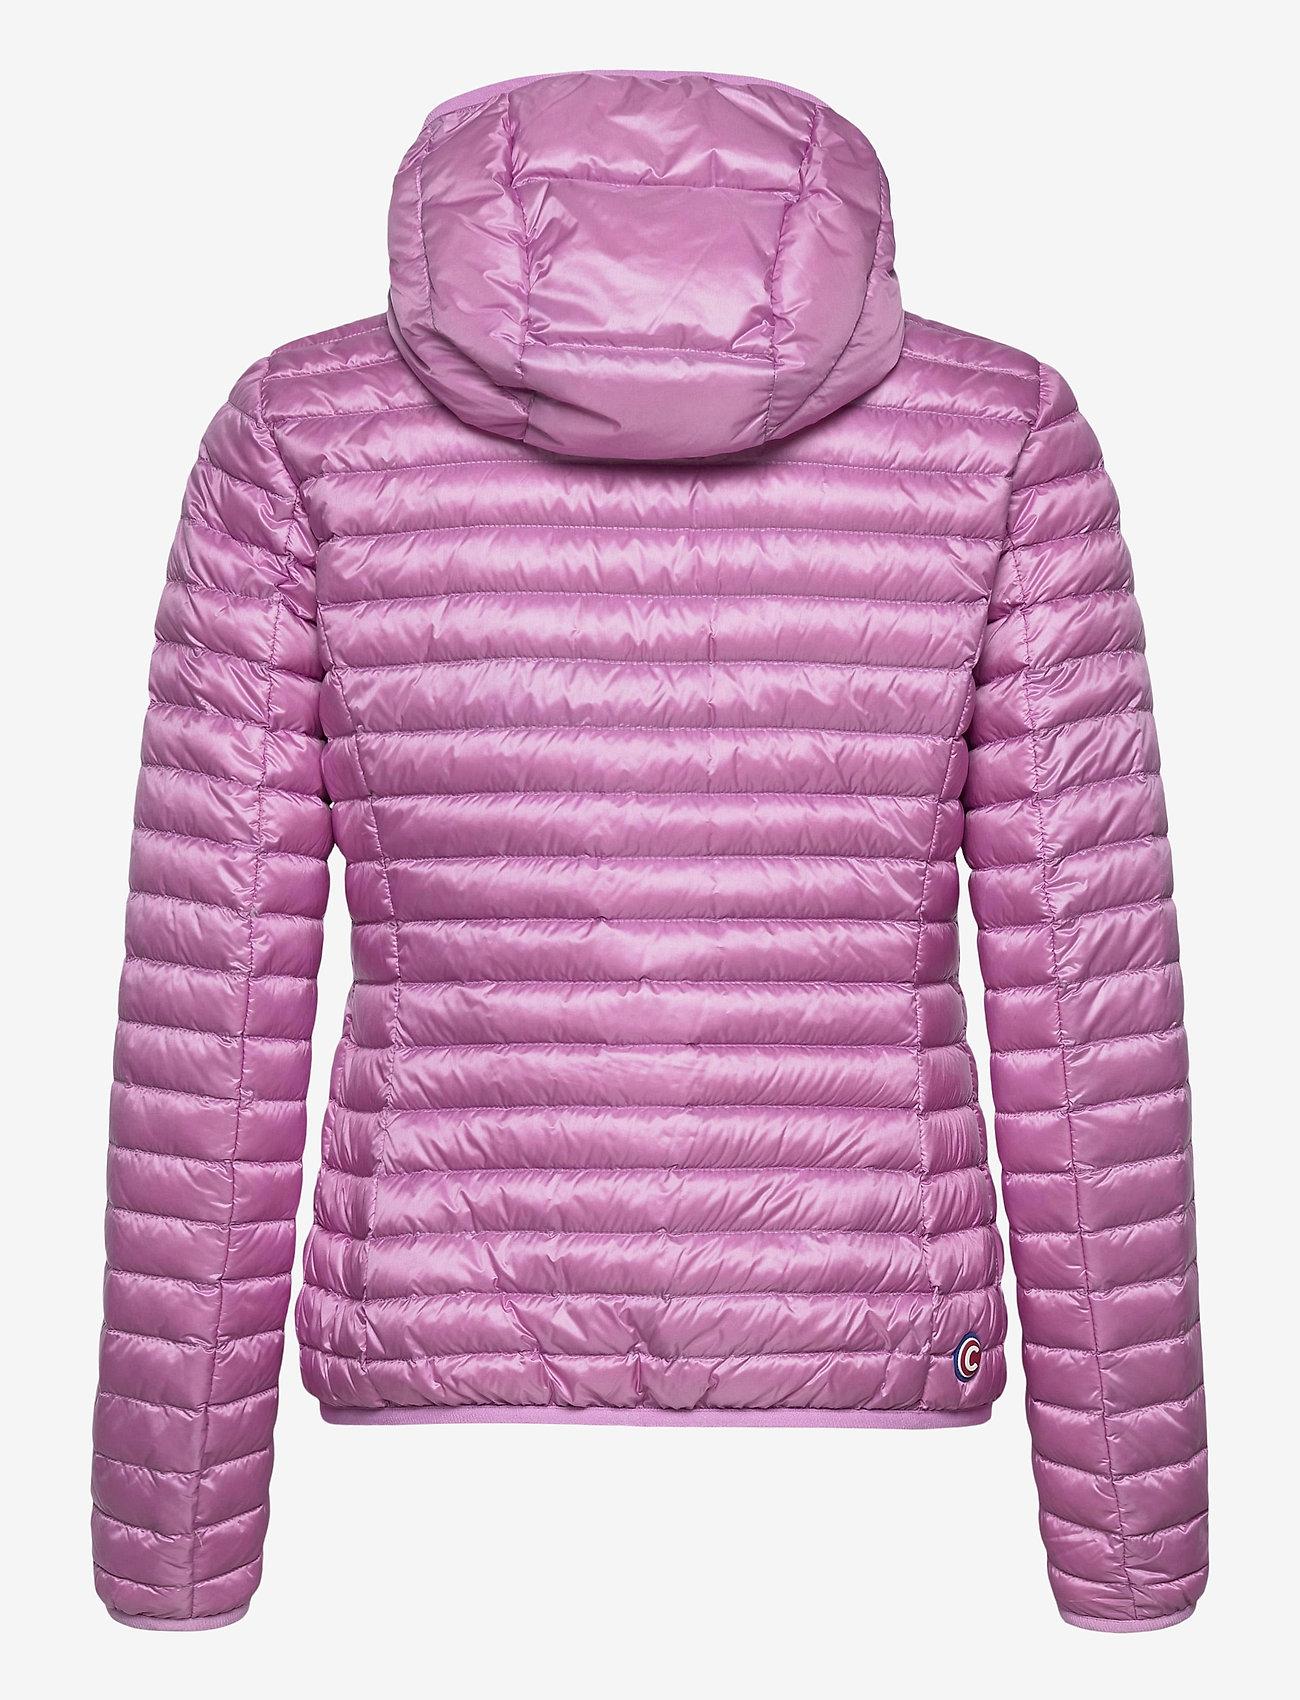 Colmar - LADIES DOWN JACKET - down- & padded jackets - etoile-light steel - 1